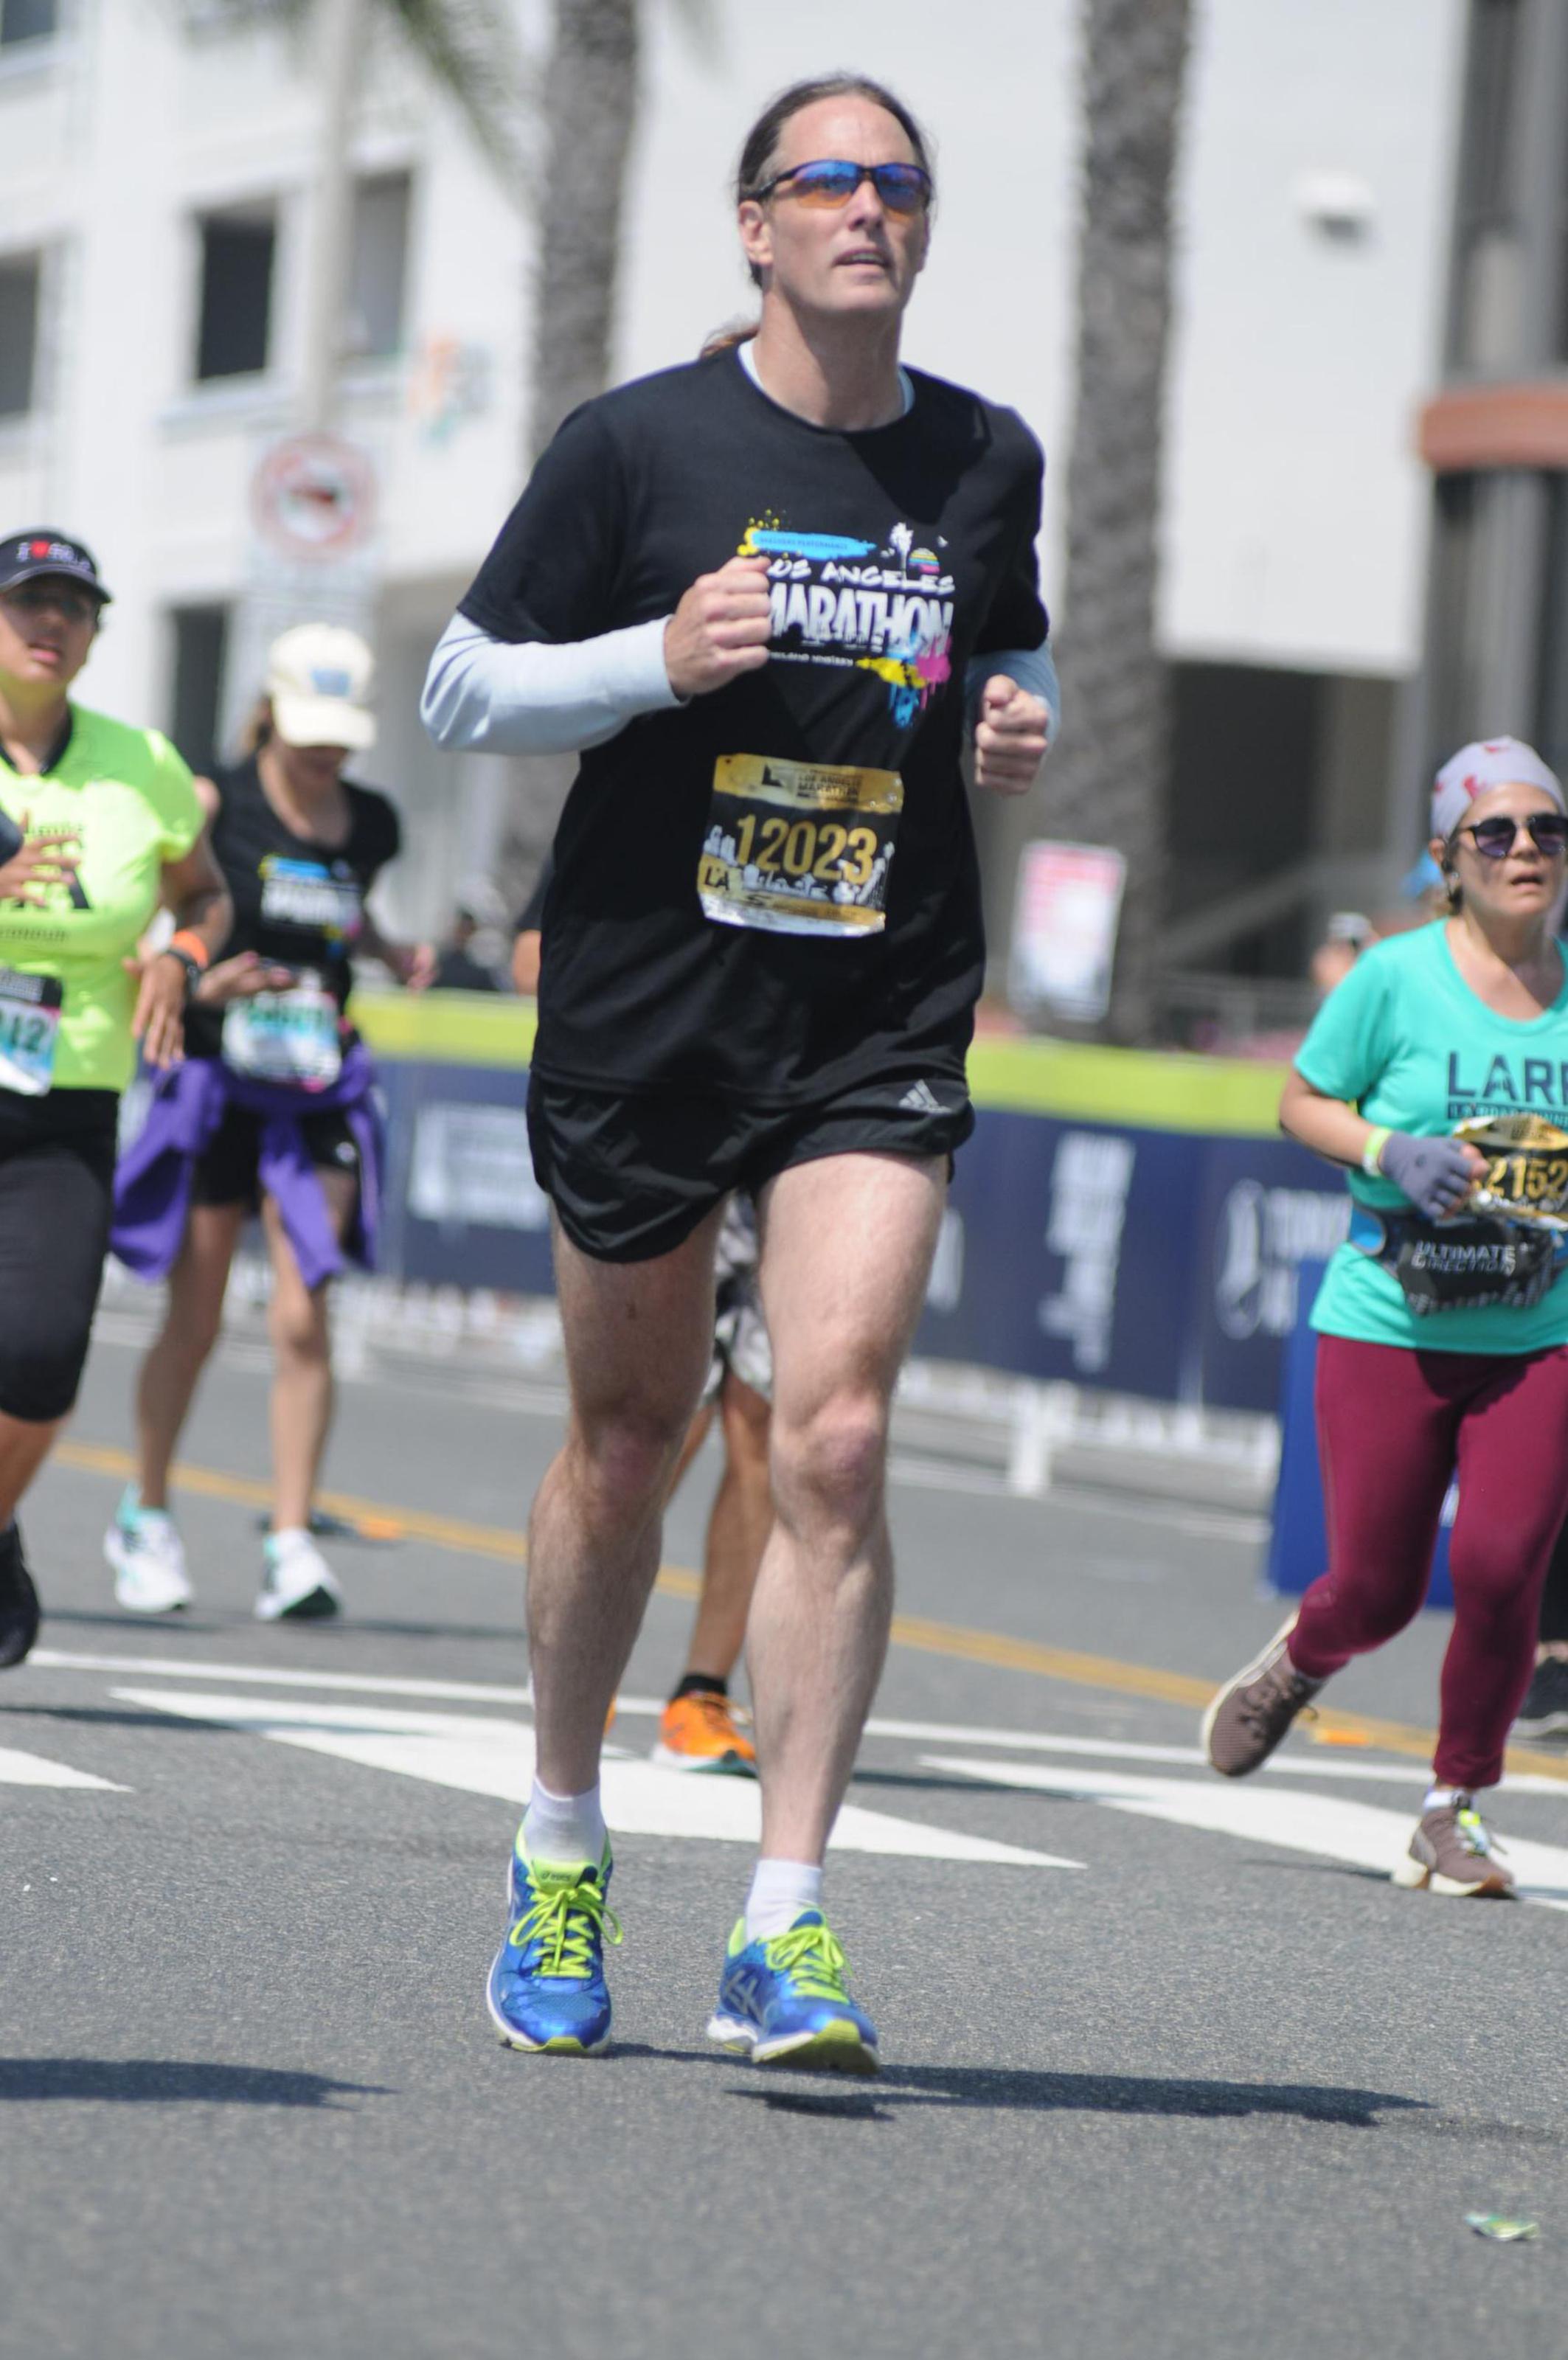 LA-Marathon-March 24-2019-rhb (2).JPG